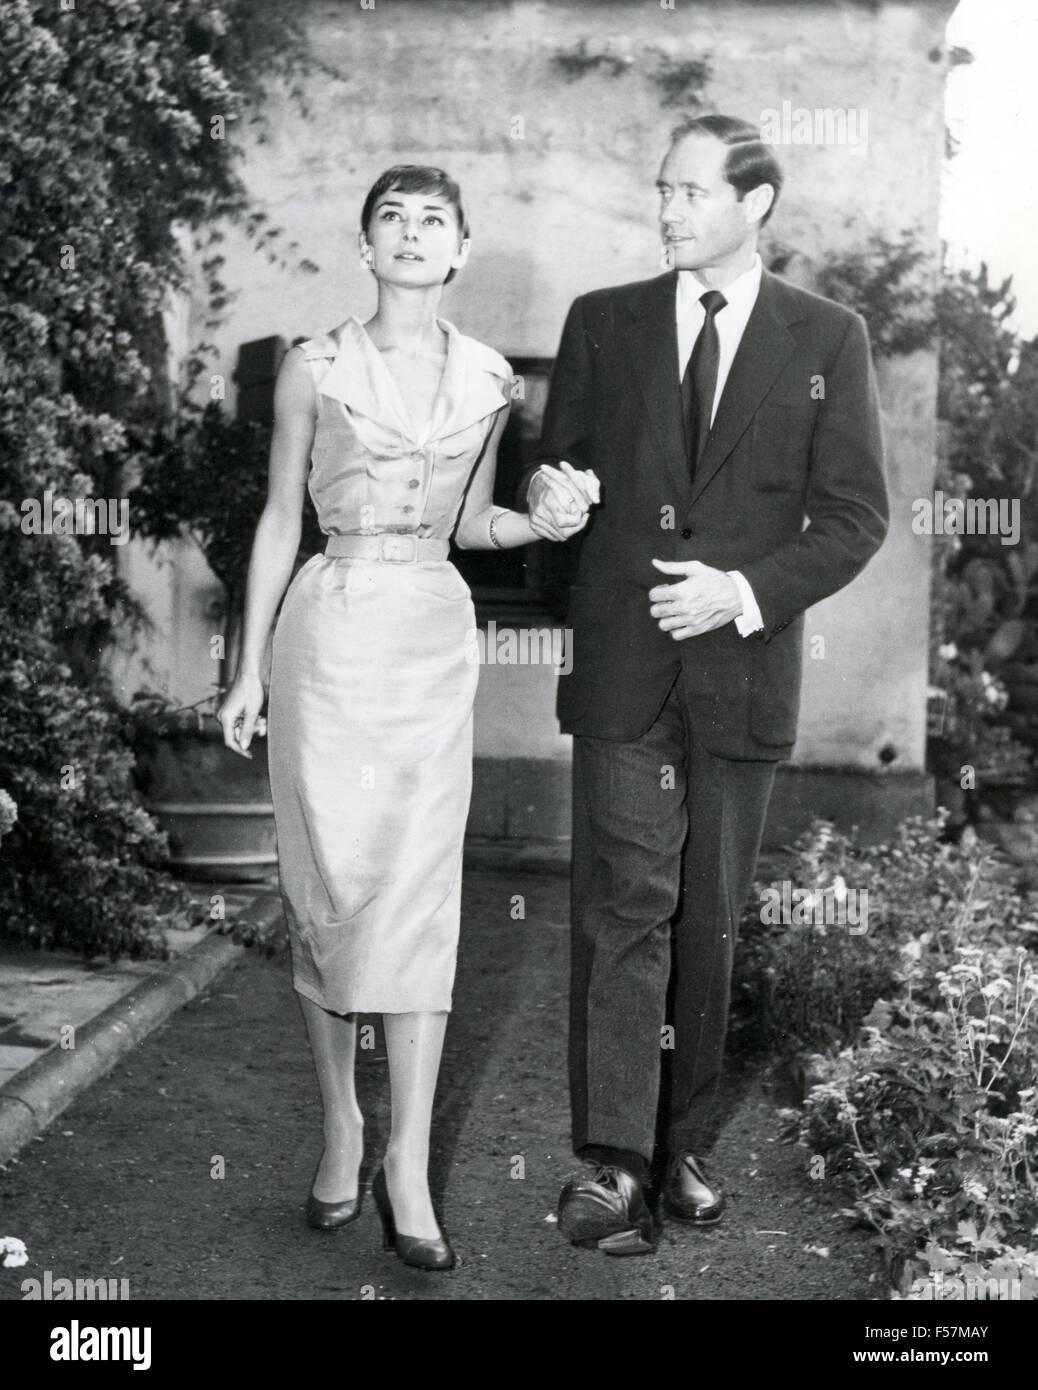 AUDREY HEPBURN British film actress with husband Mel Ferrer about 1956 - Stock Image